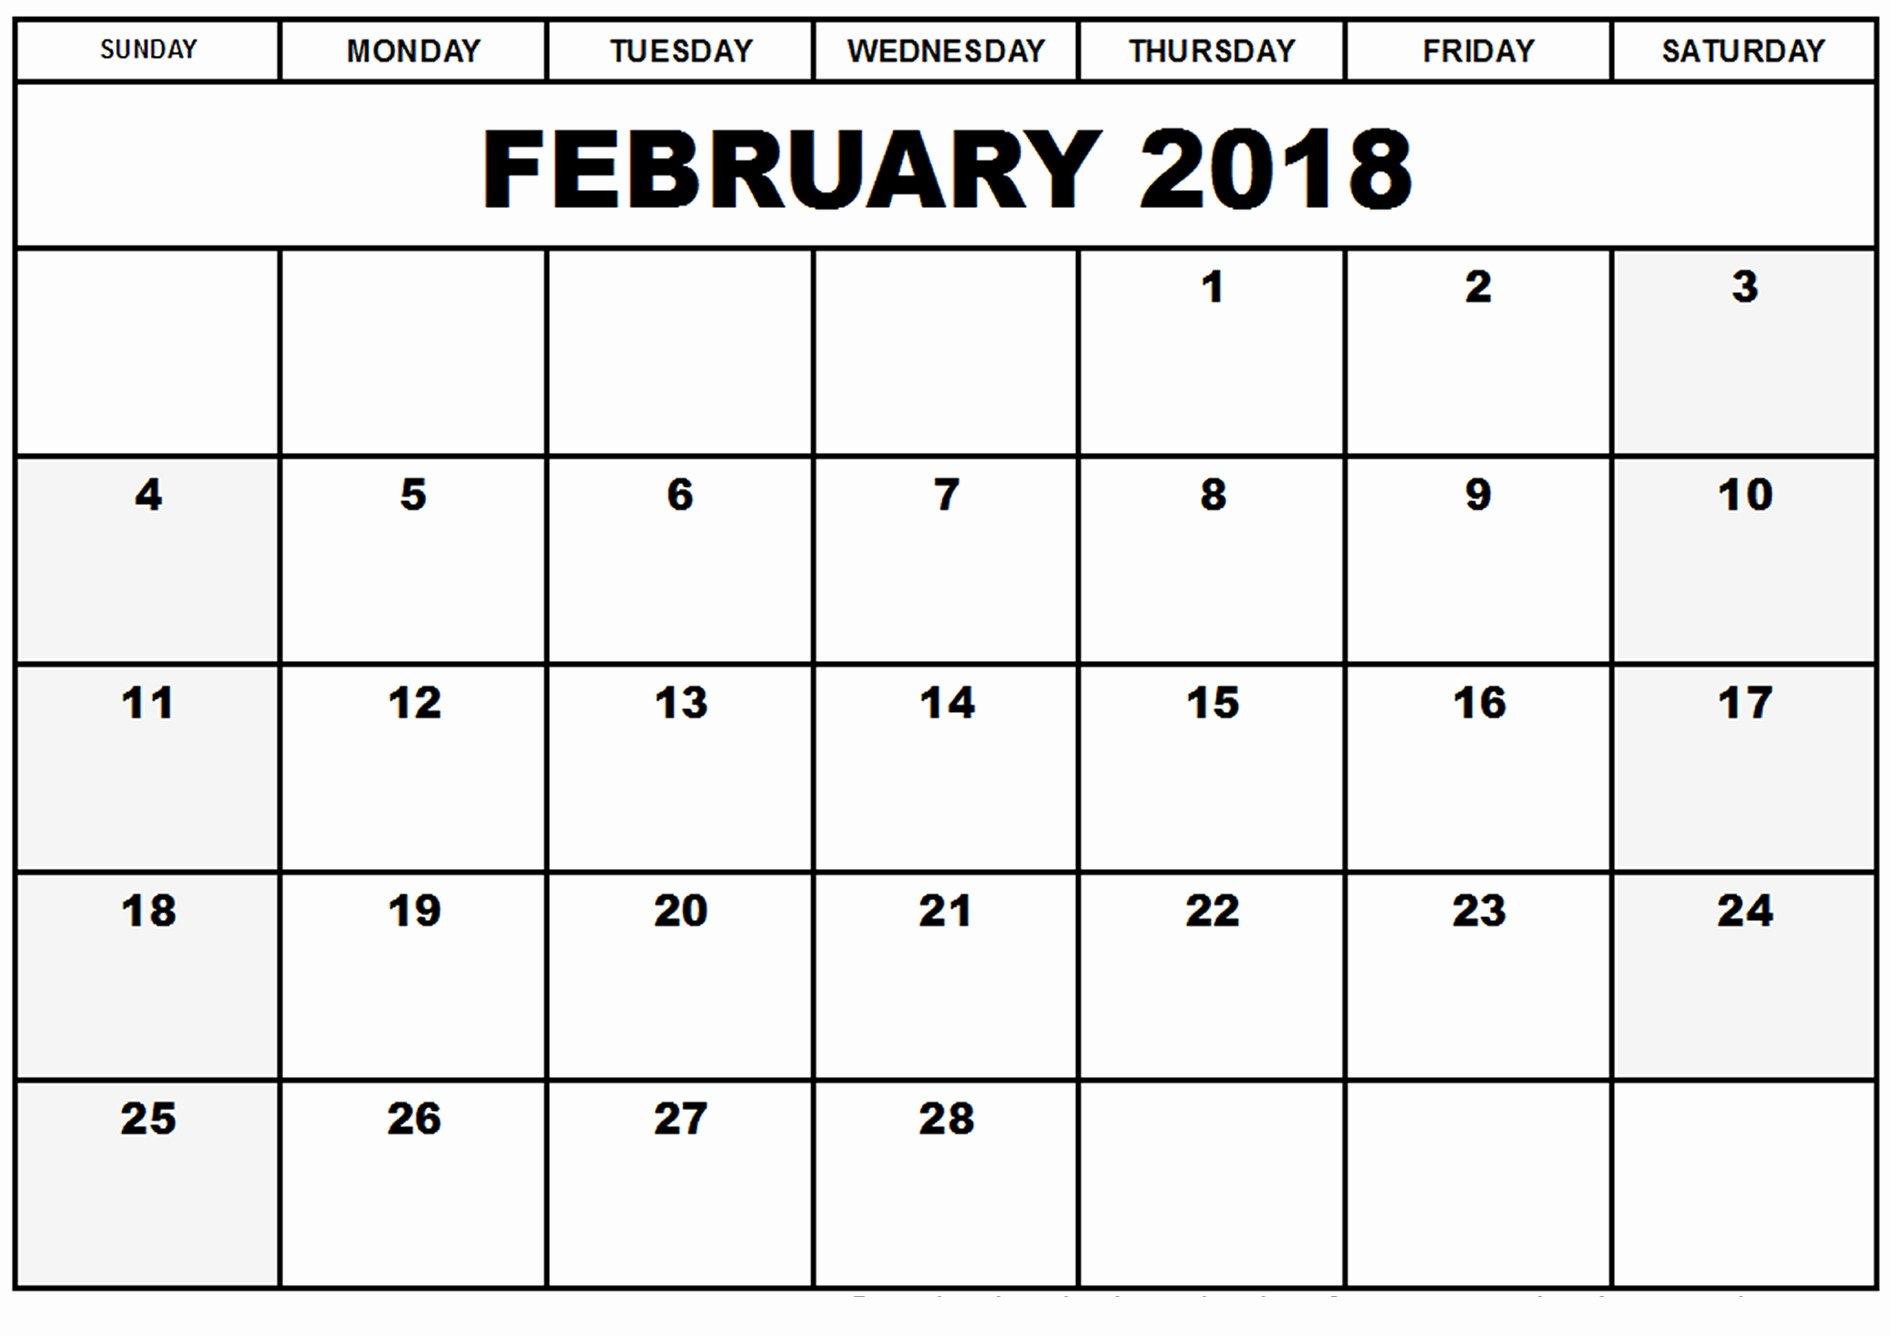 Free February 2018 Printable Calendar Template